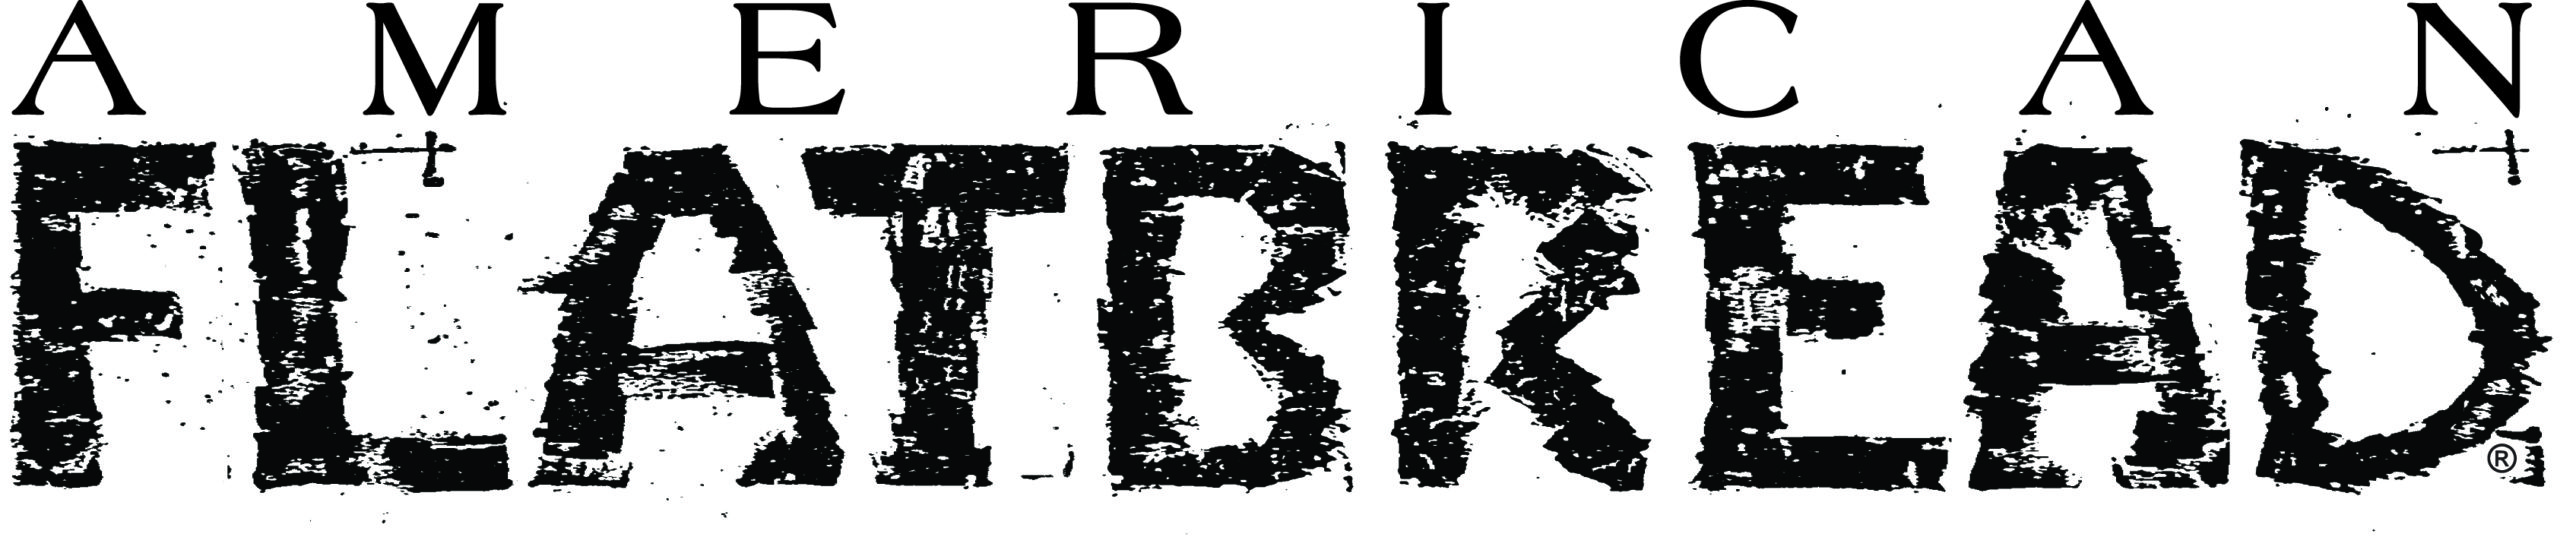 American Flatbread logo